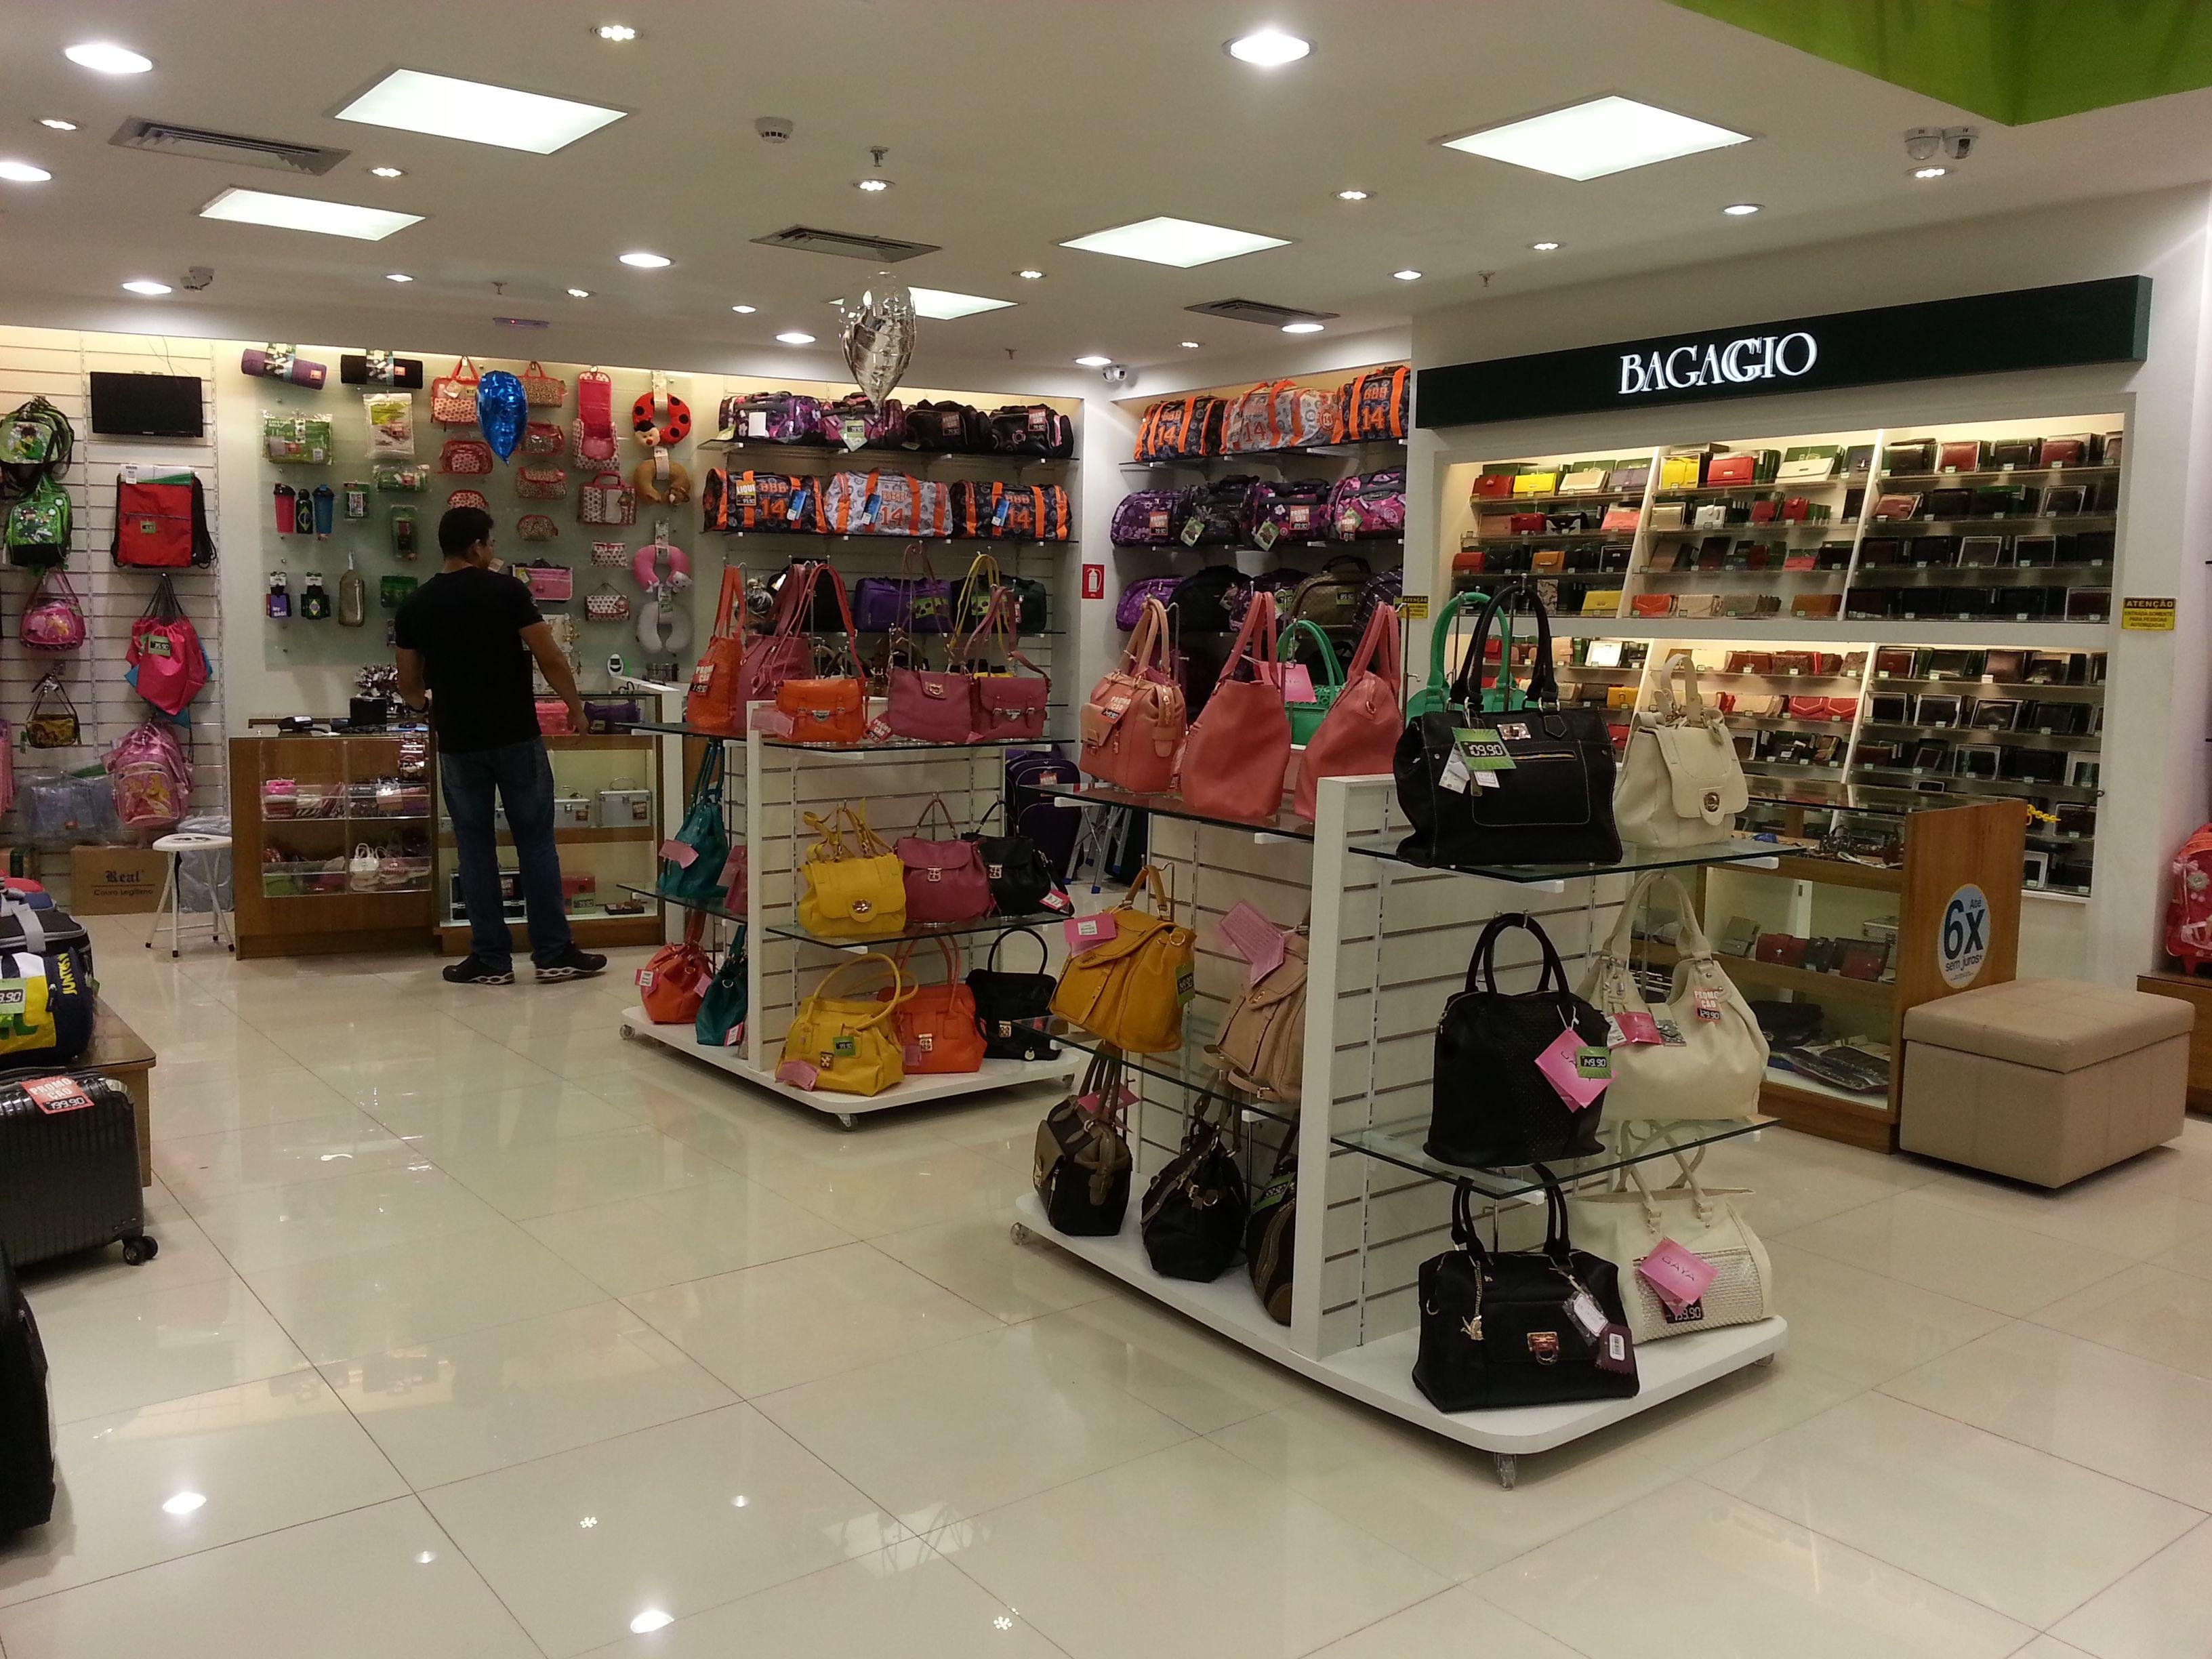 641c006dcb4b47 layout de lojas BOLSAS E ACESSORIOS - Pesquisa Google   LAYOUT LOJAS ...